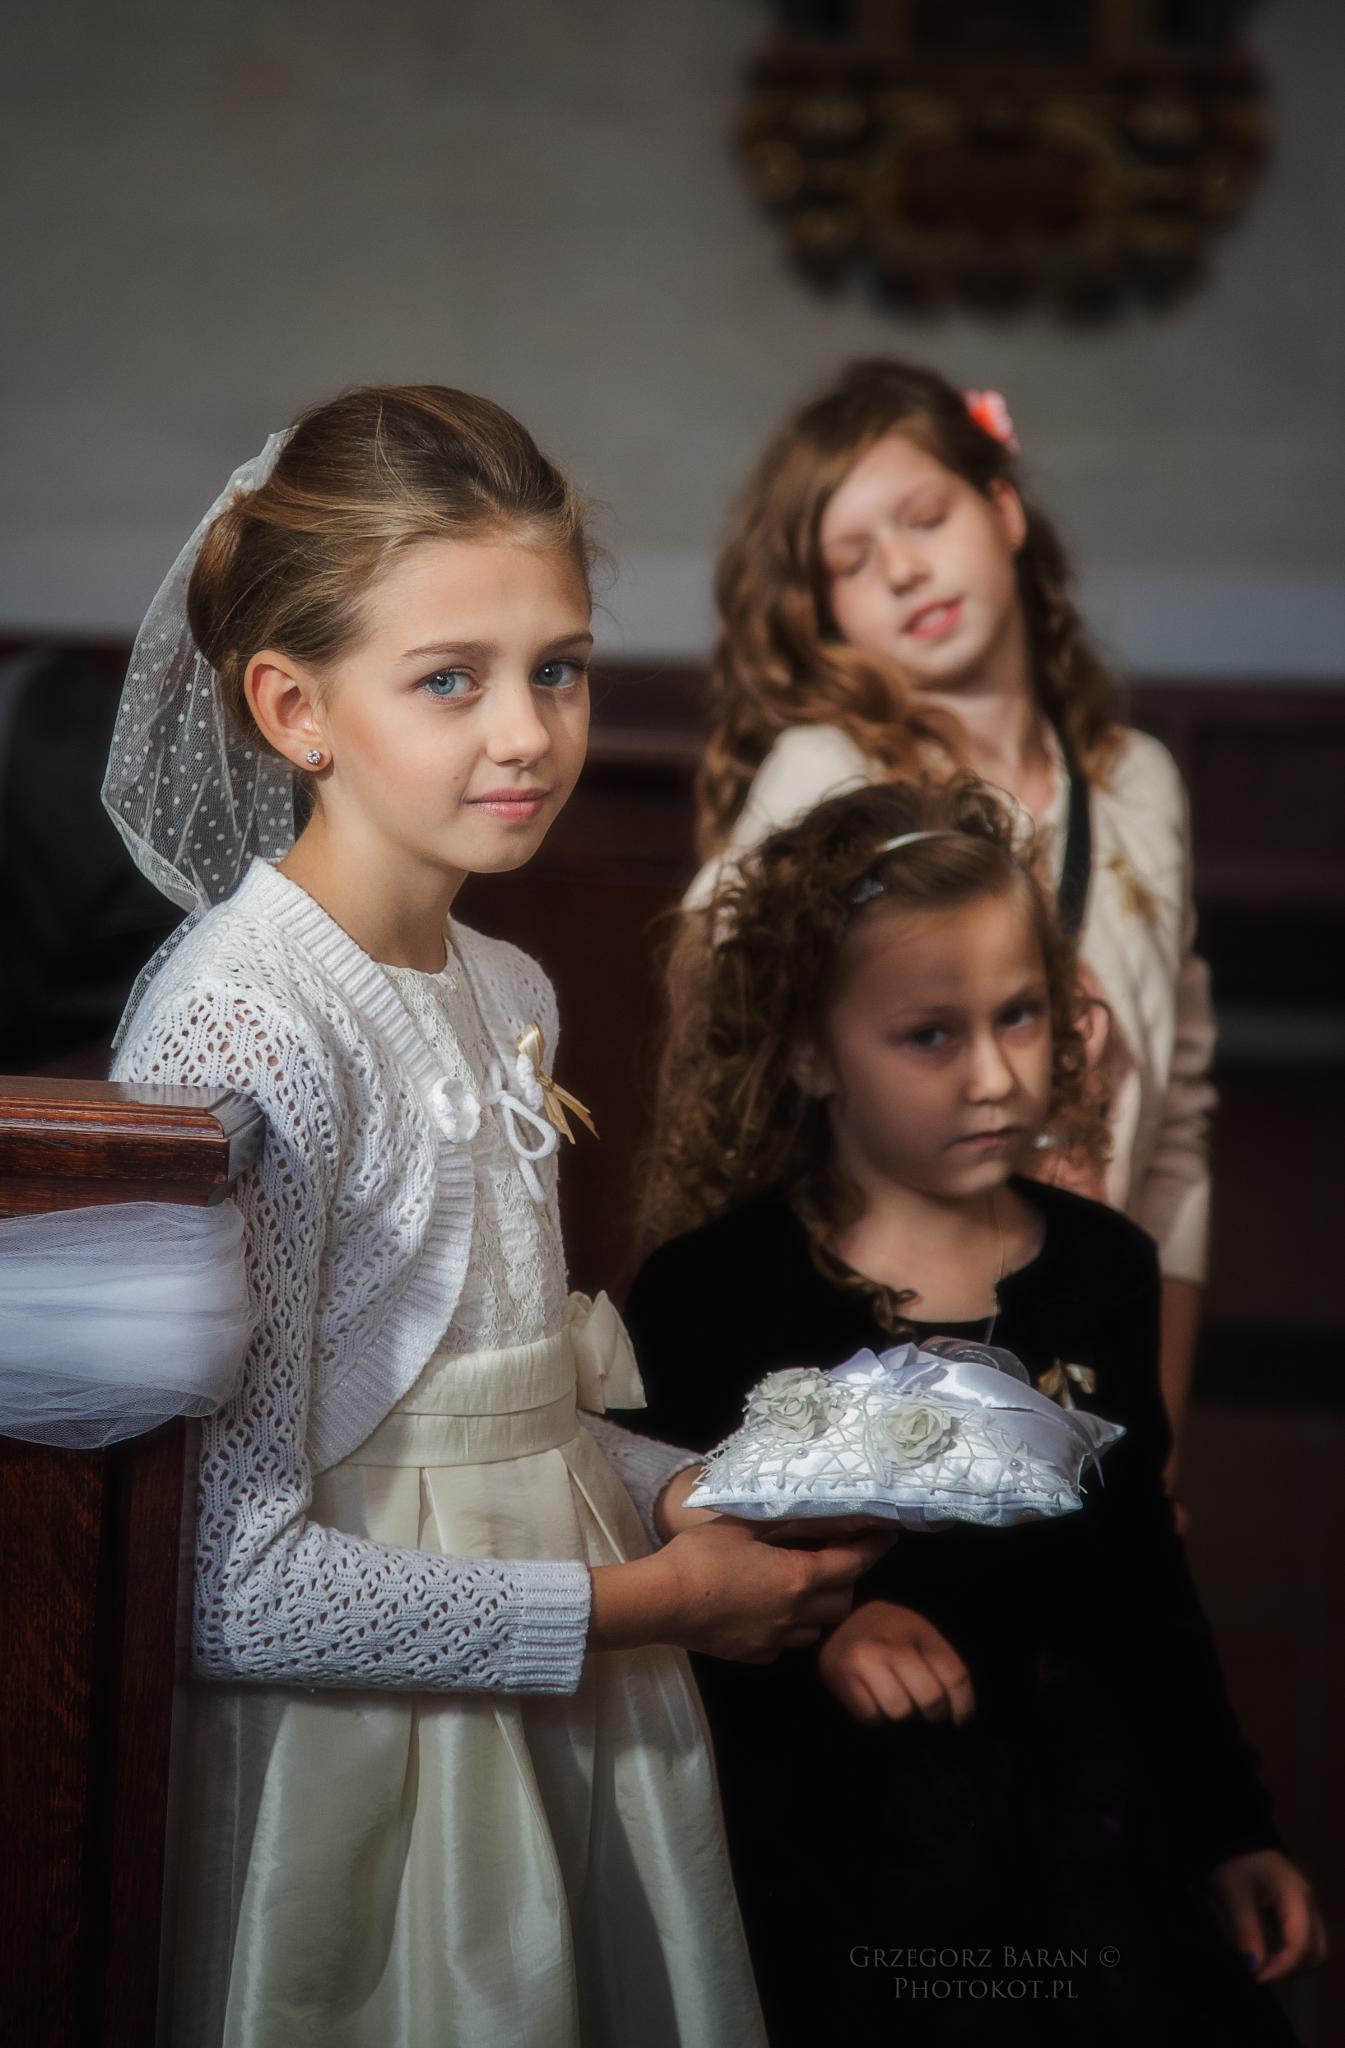 The girls in the church by Grzegorz Baran